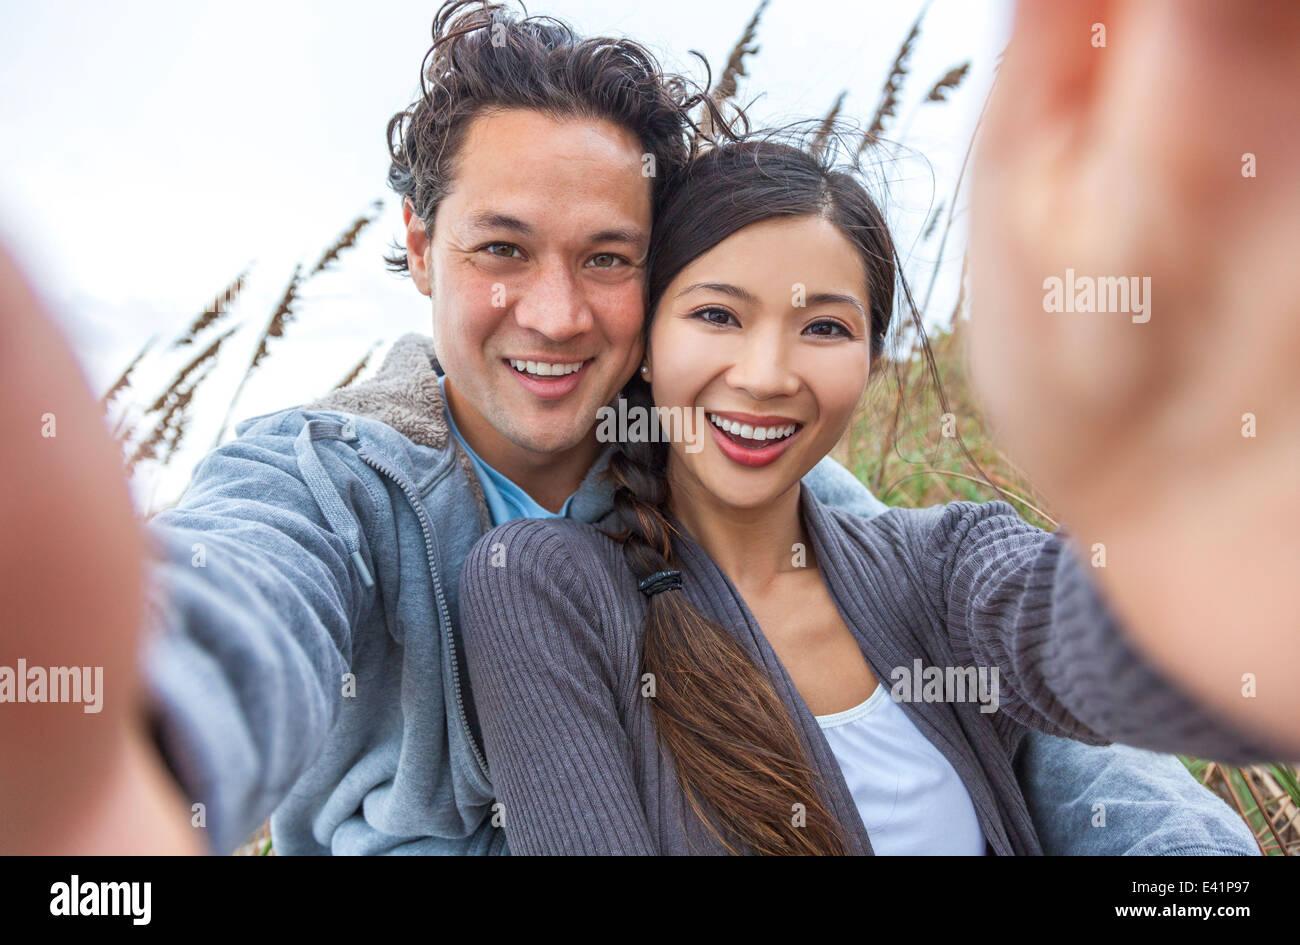 Man & woman Asian couple, boyfriend girlfriend in bikini, taking vacation selfie photograph at the beach - Stock Image